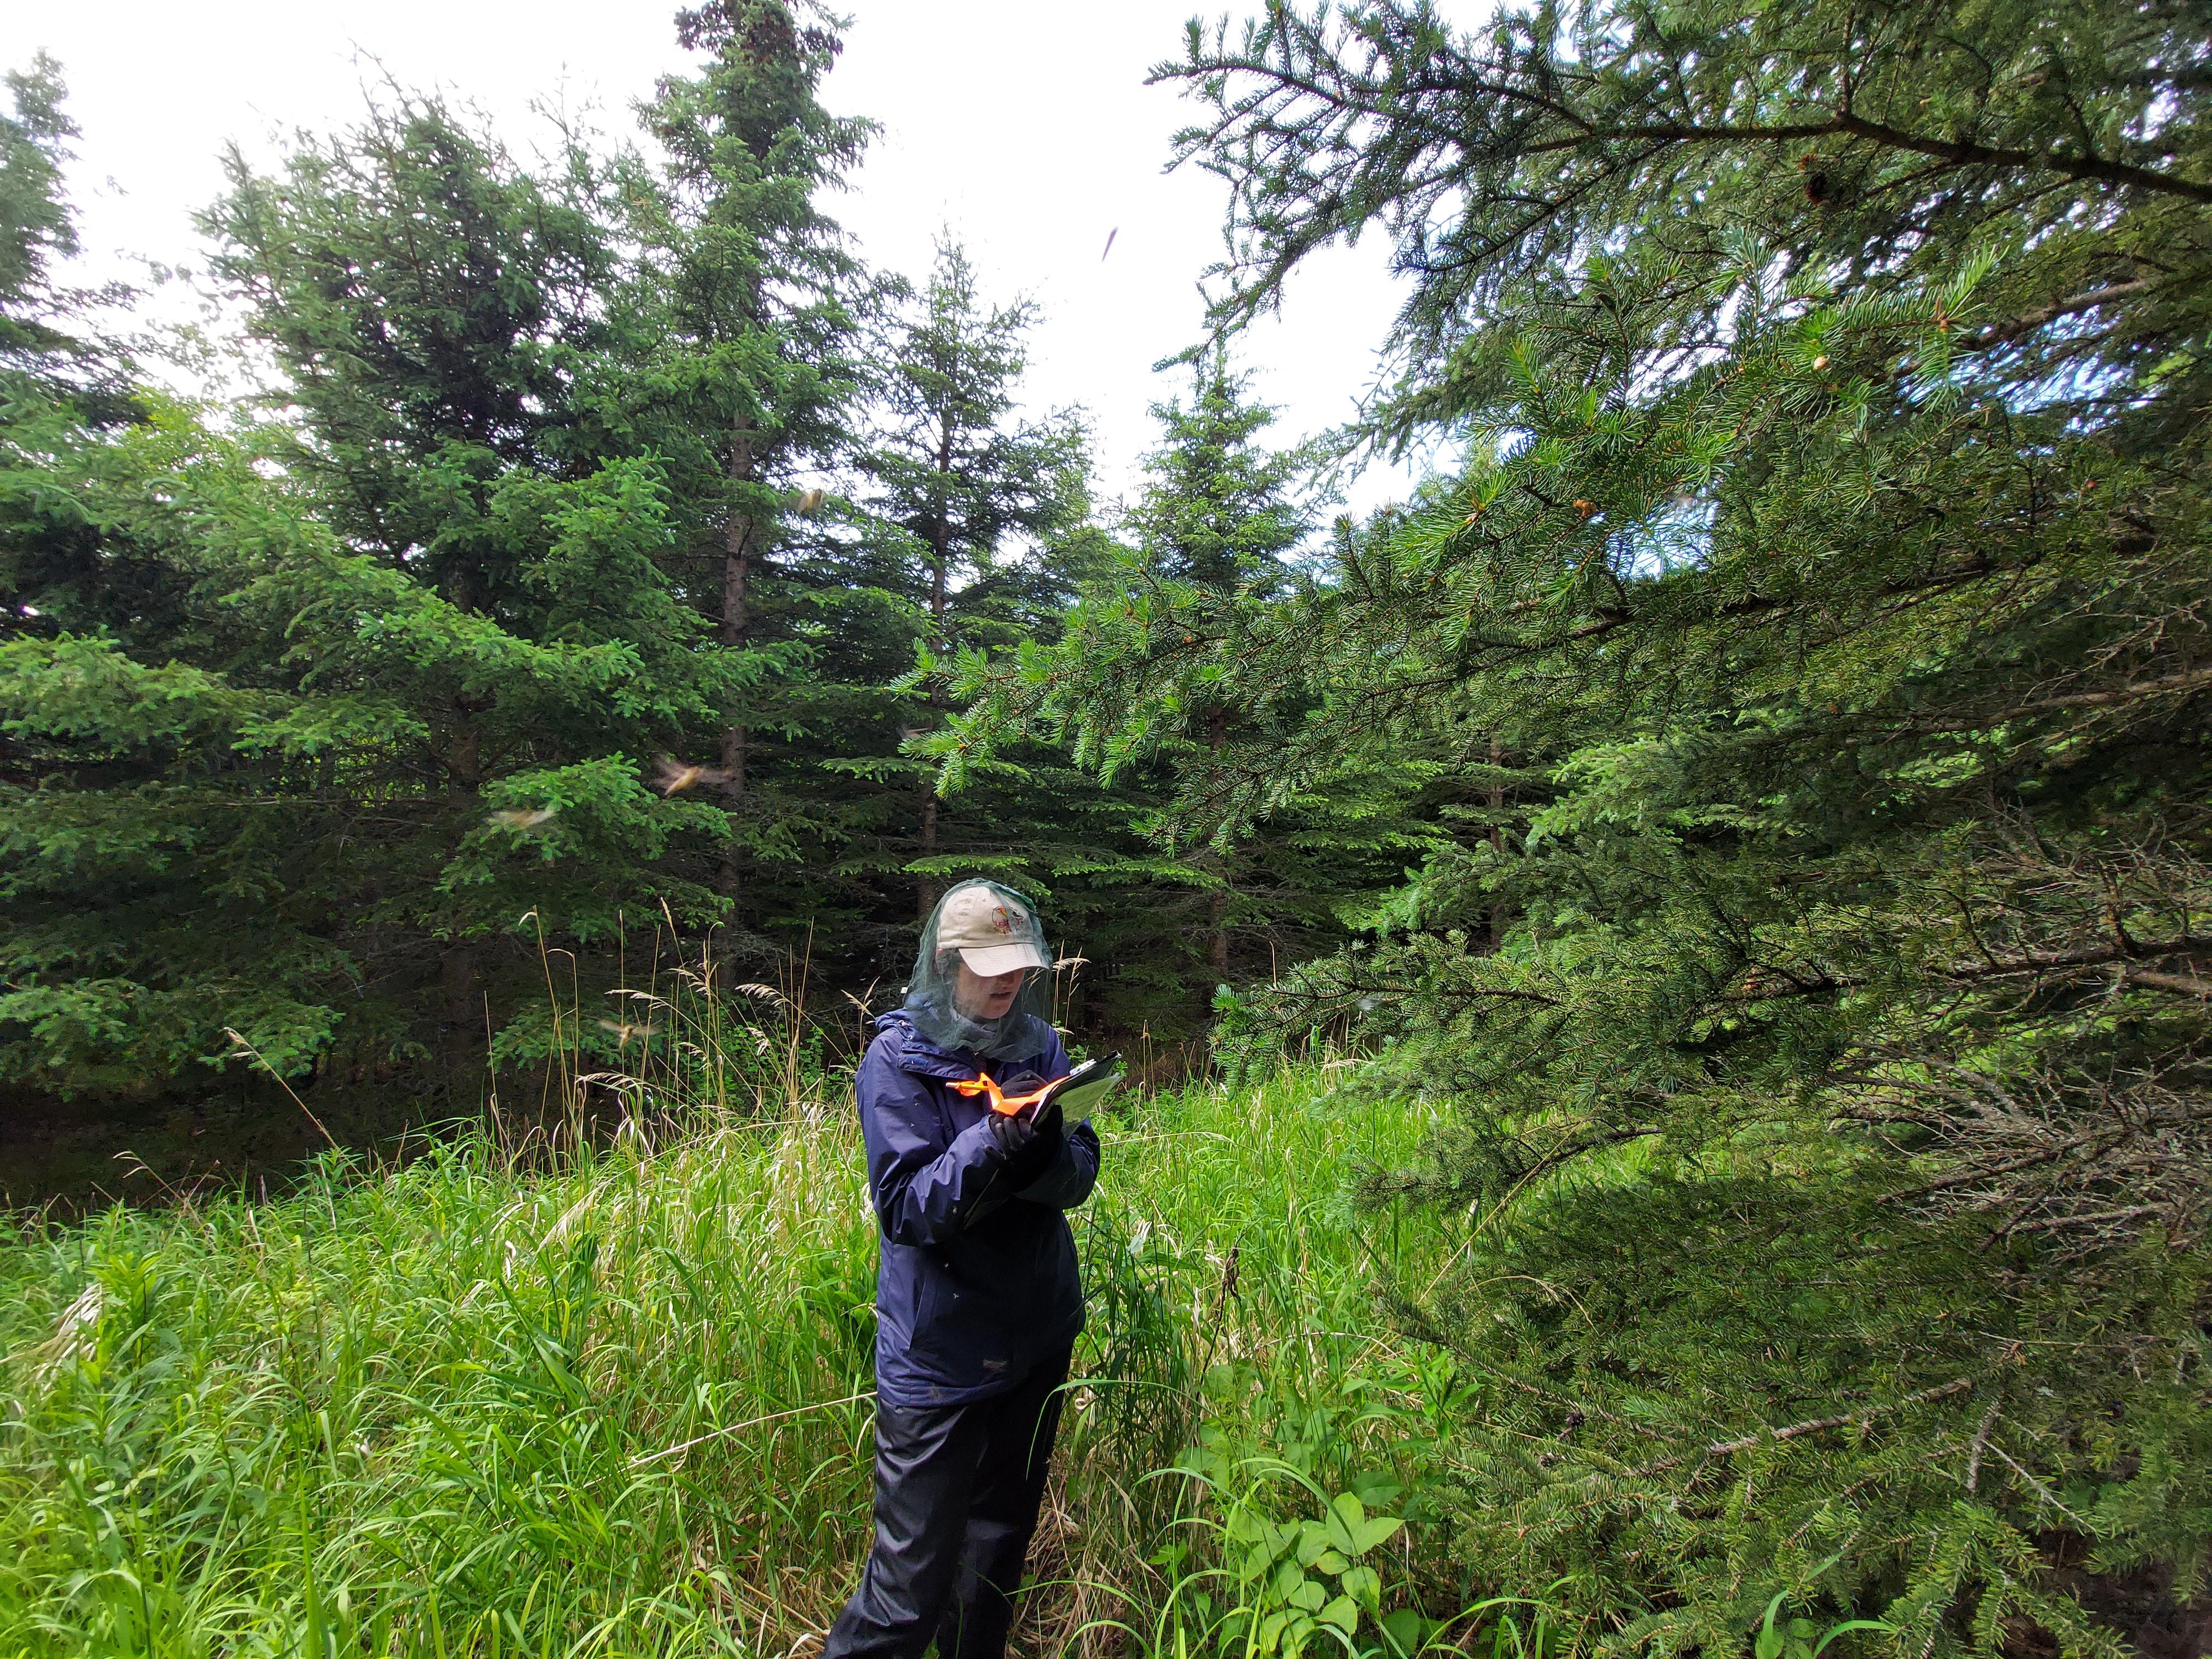 Woman standing amongst spruce